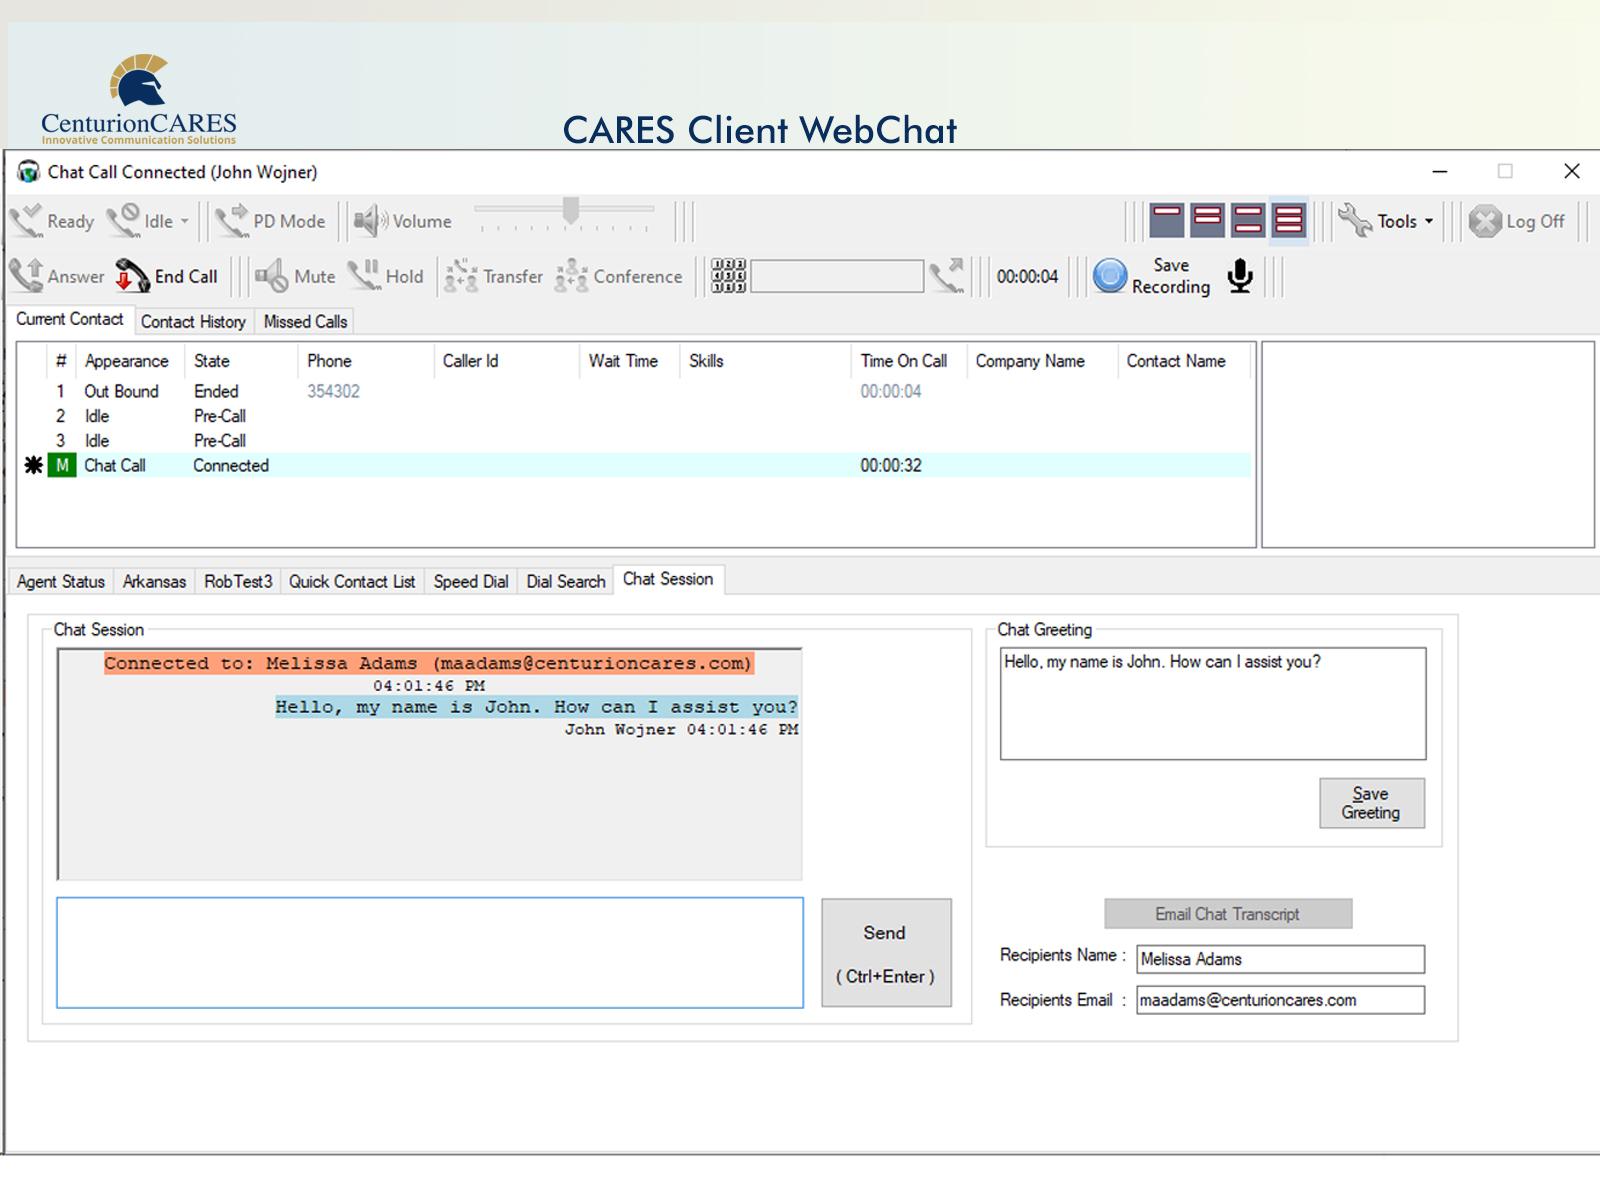 CARES Webchat Dashboard